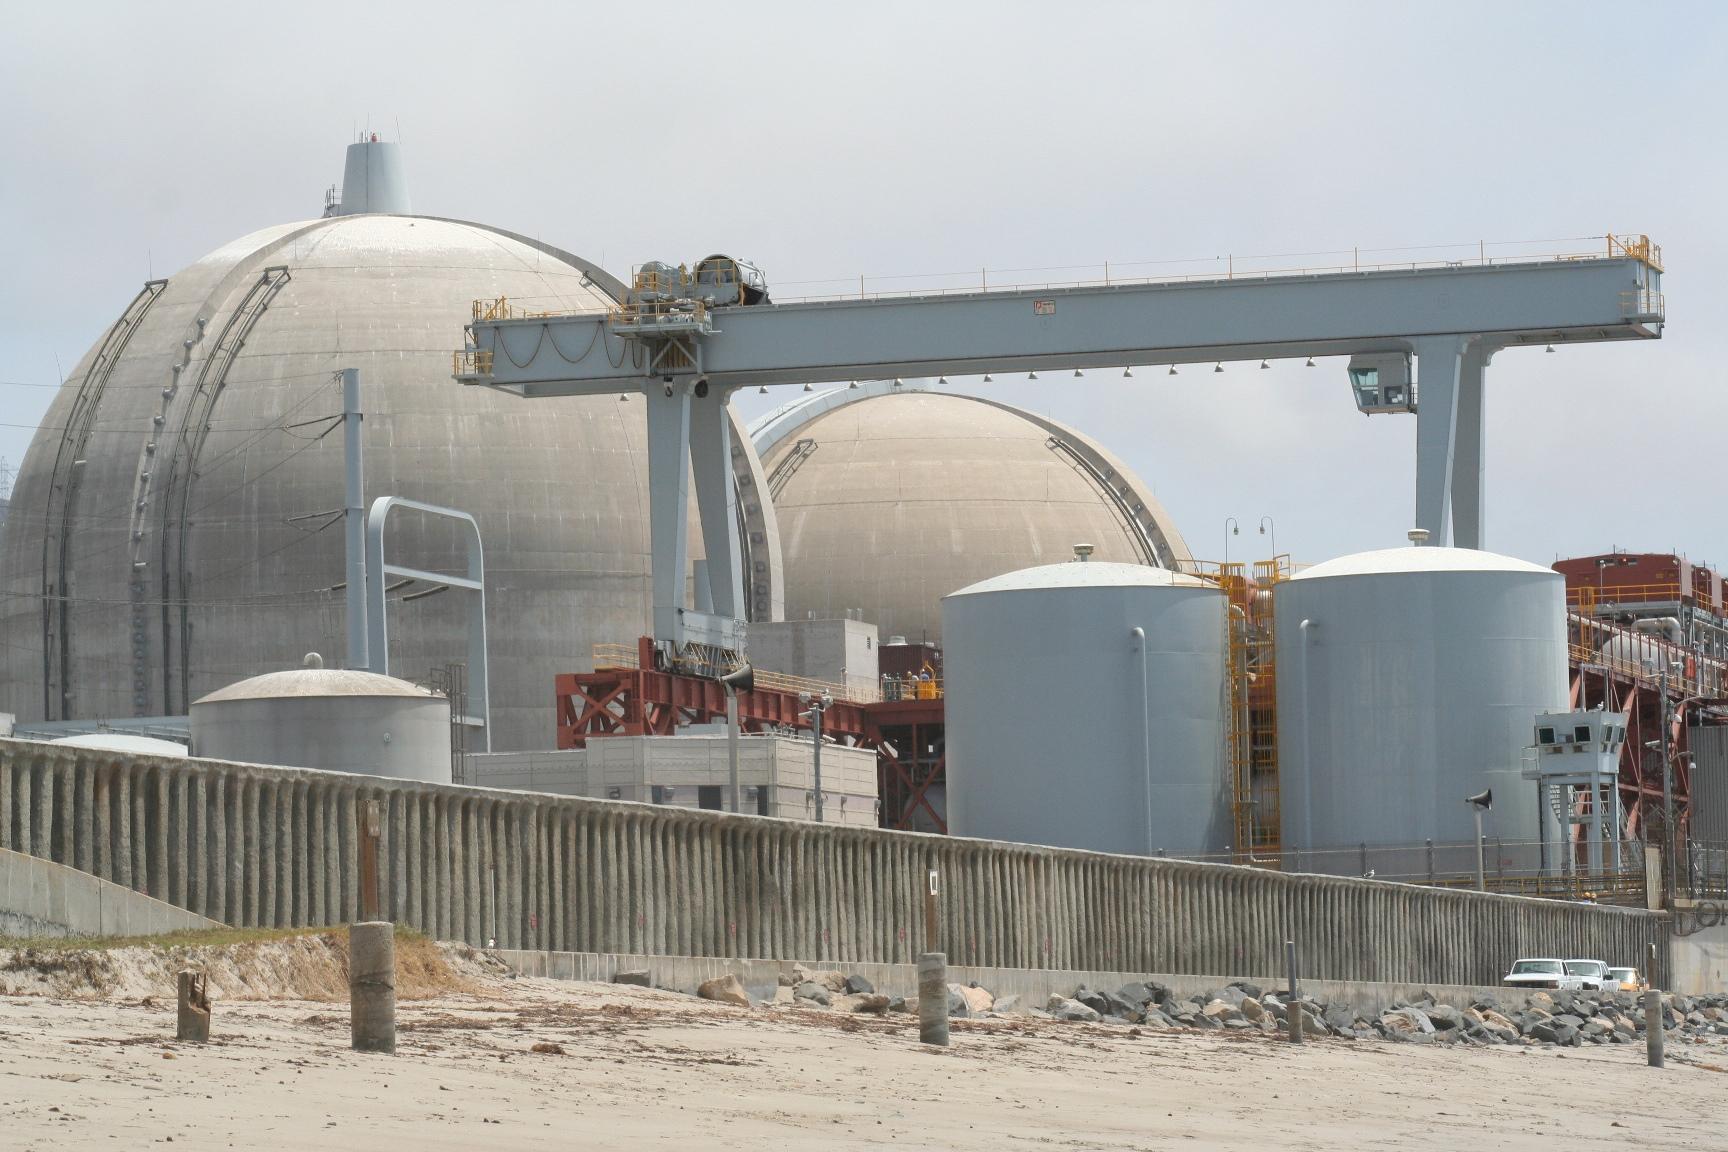 Southern California Edisonu0027s Community Panel Will Meet In San Juan  Capistrano Tuesday To Discuss Spent Fuel